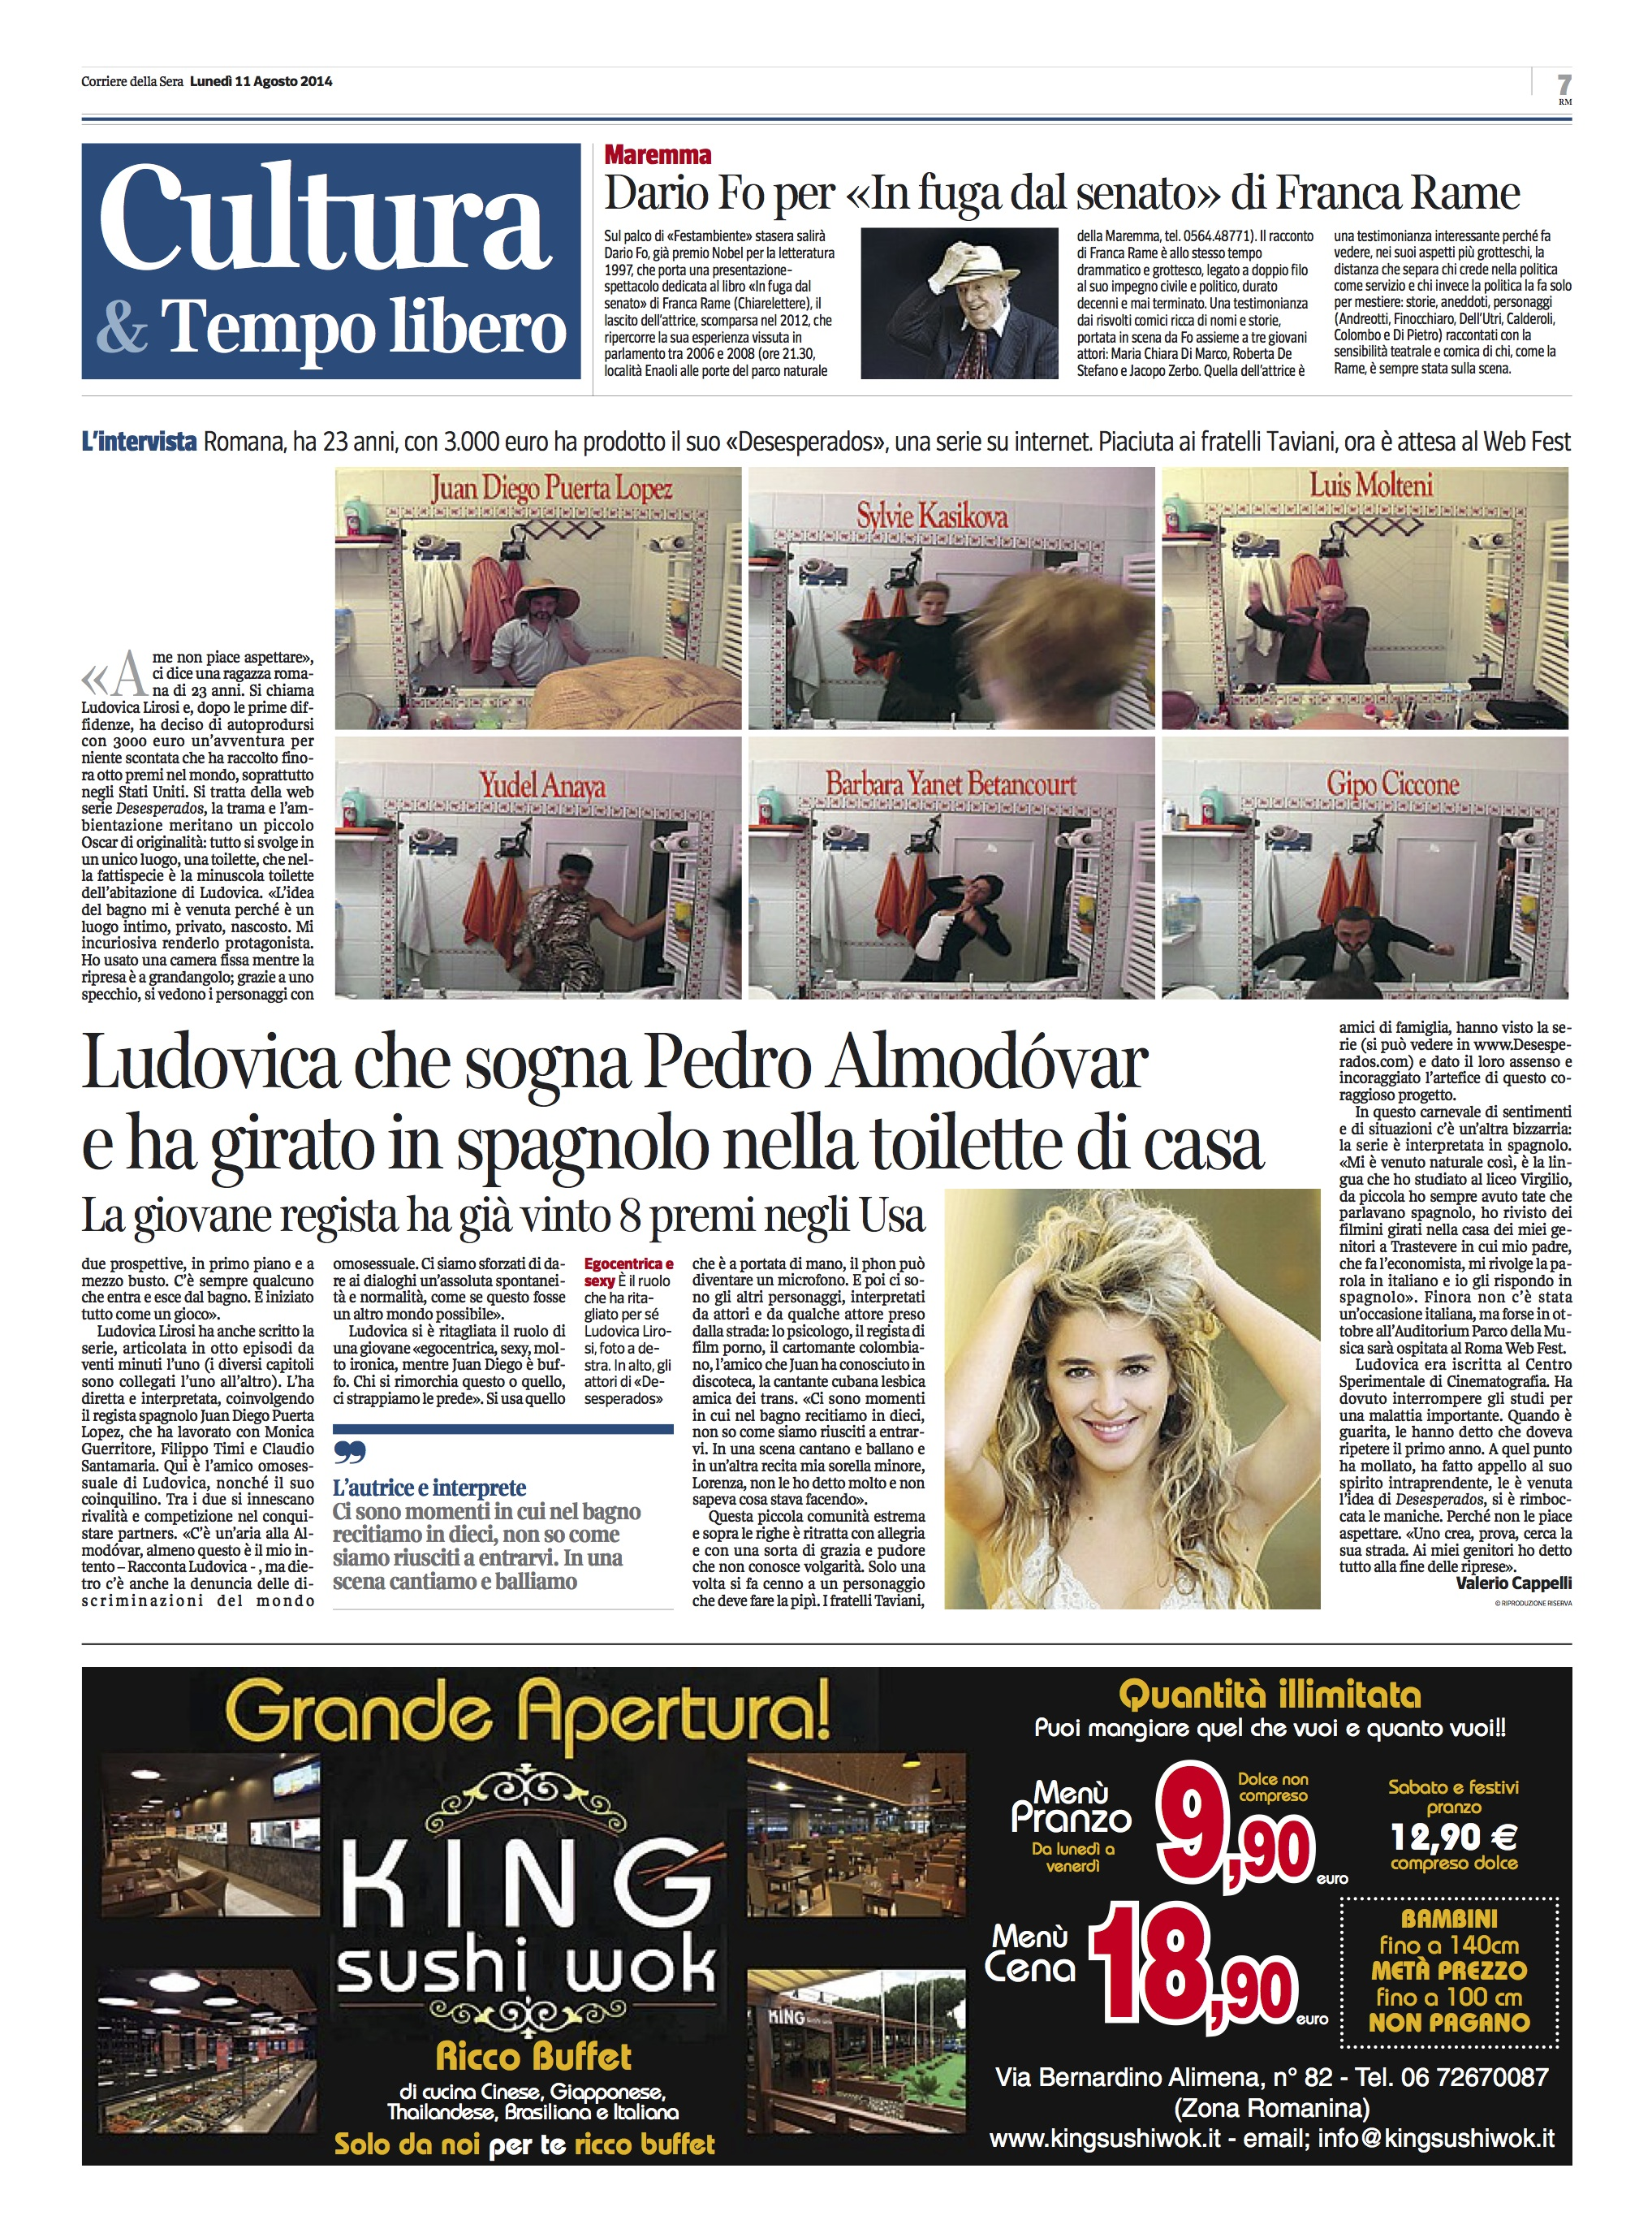 LUDOVICA LIROSI NEWS